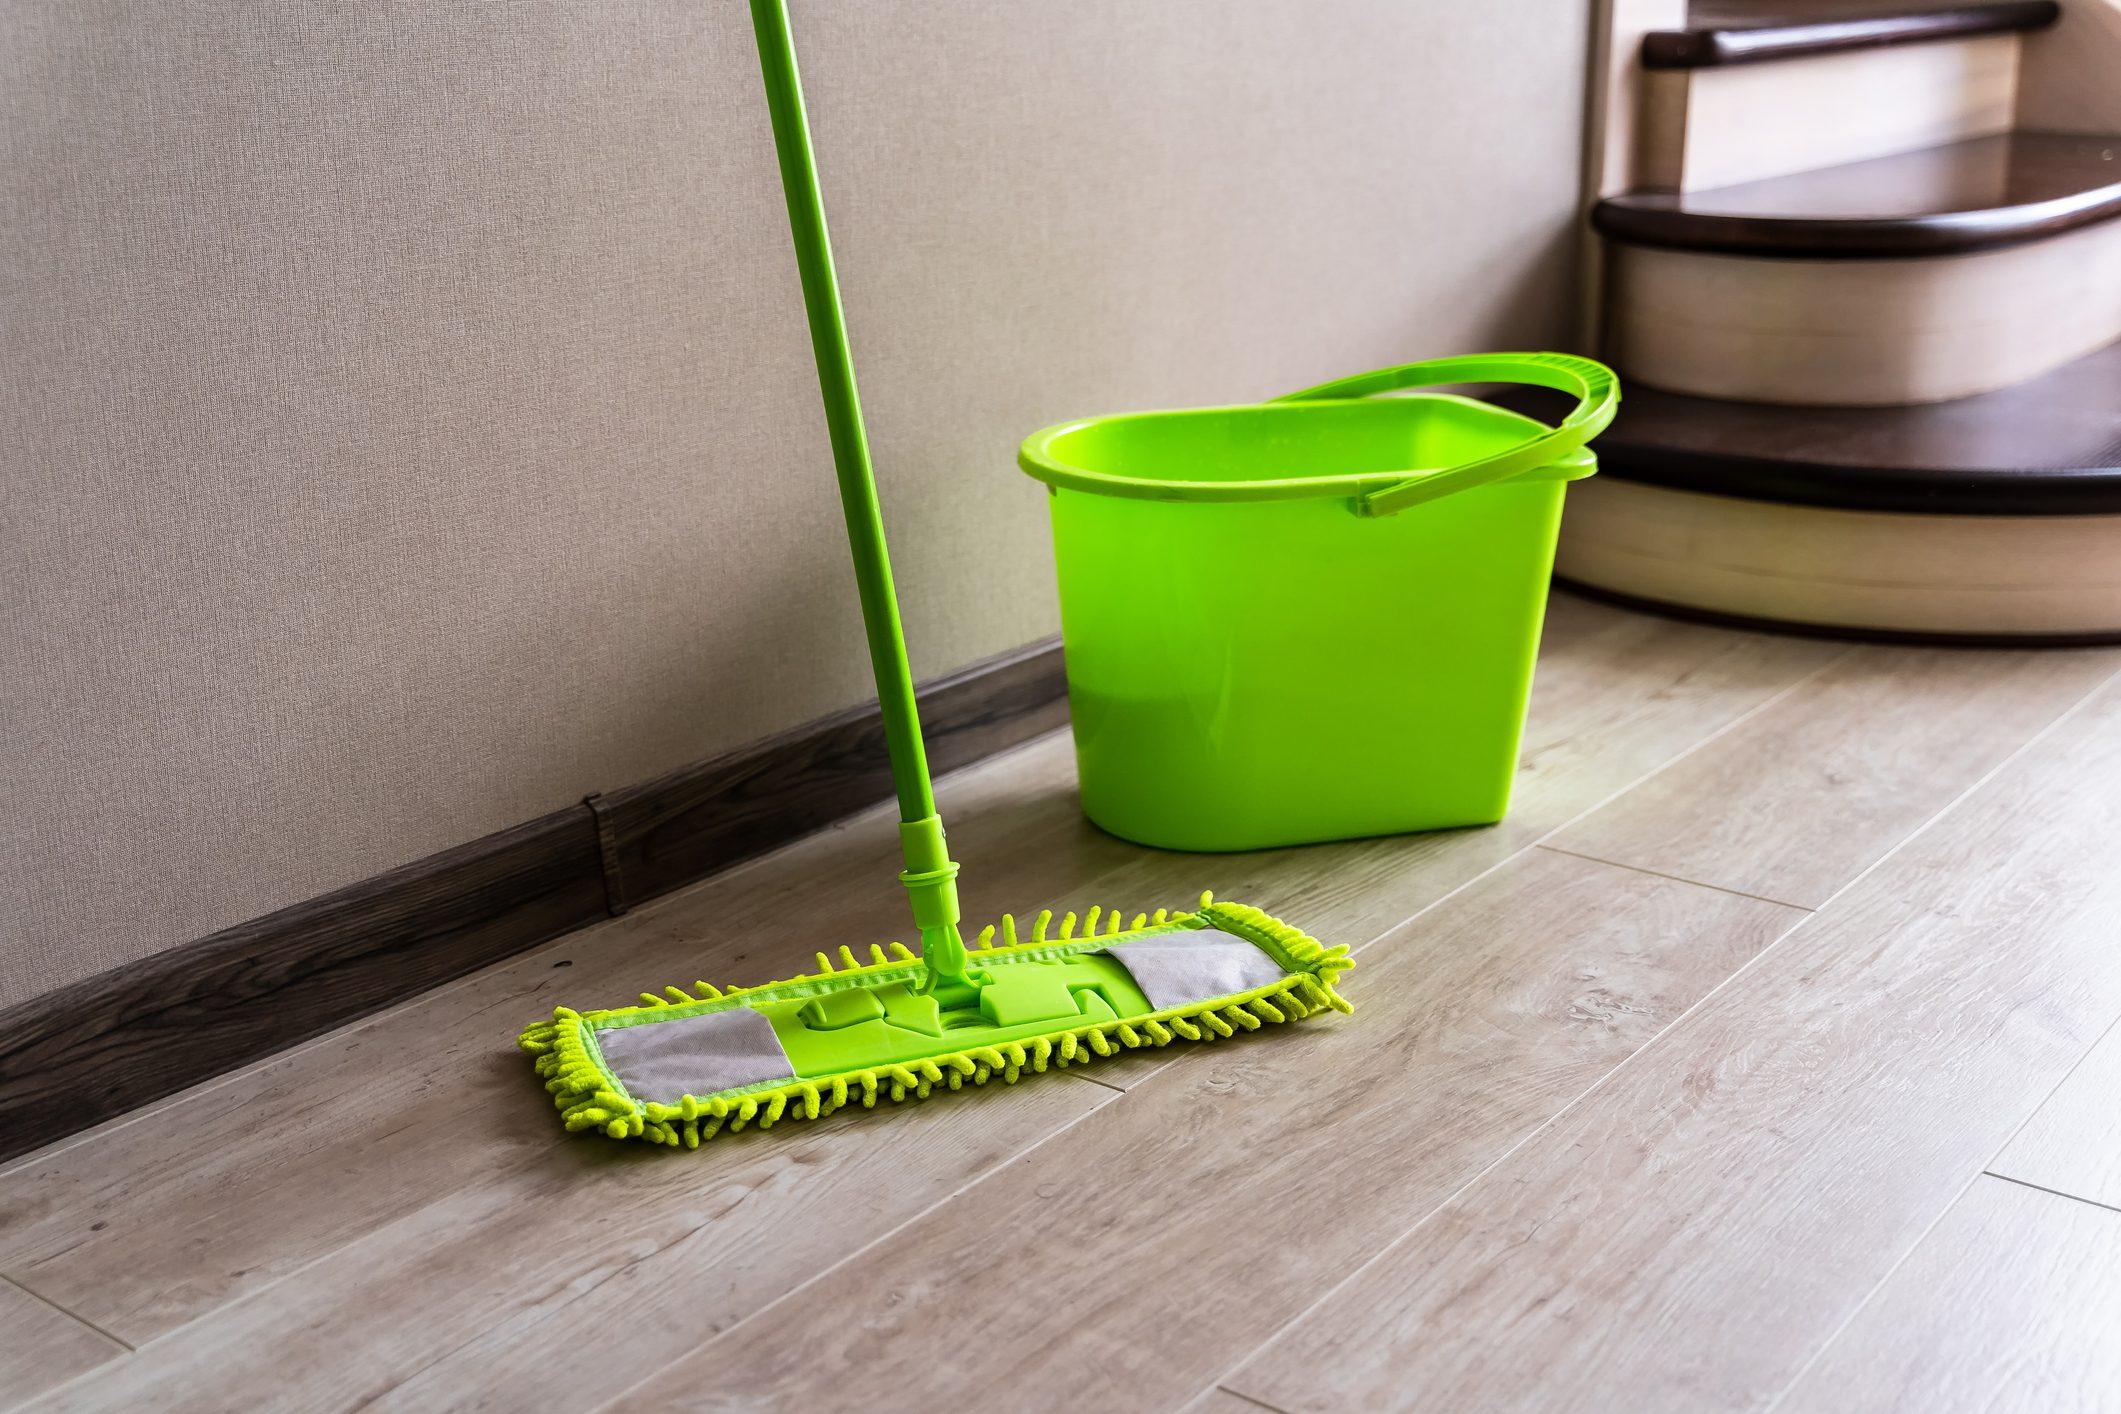 Mop with green microfiber rag, green plastic handle and bucket.